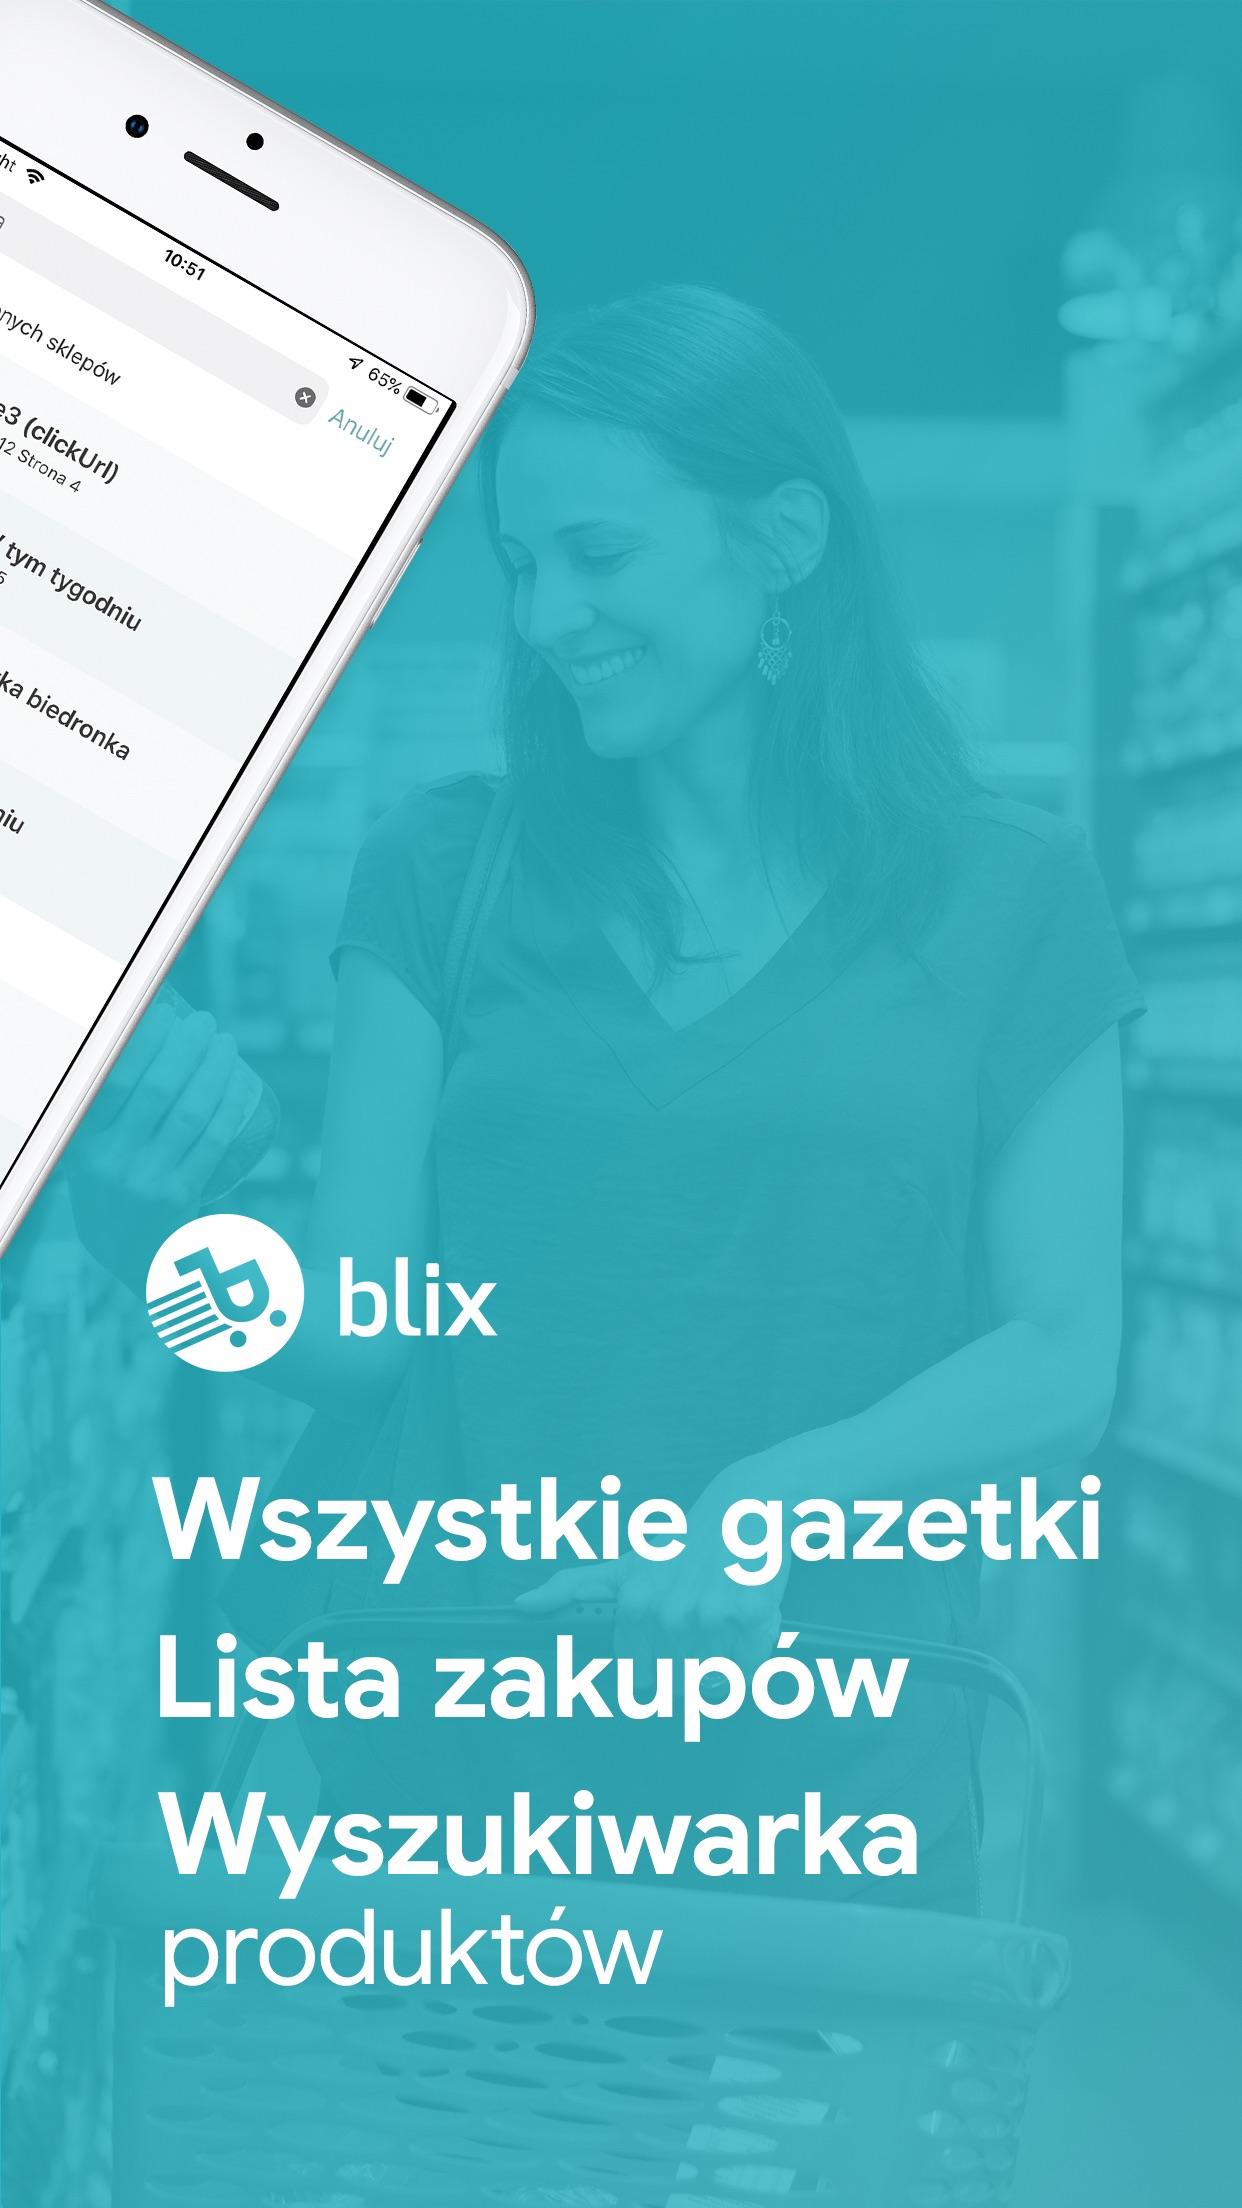 Blix Gazetki Promocje Sklepy Screenshot